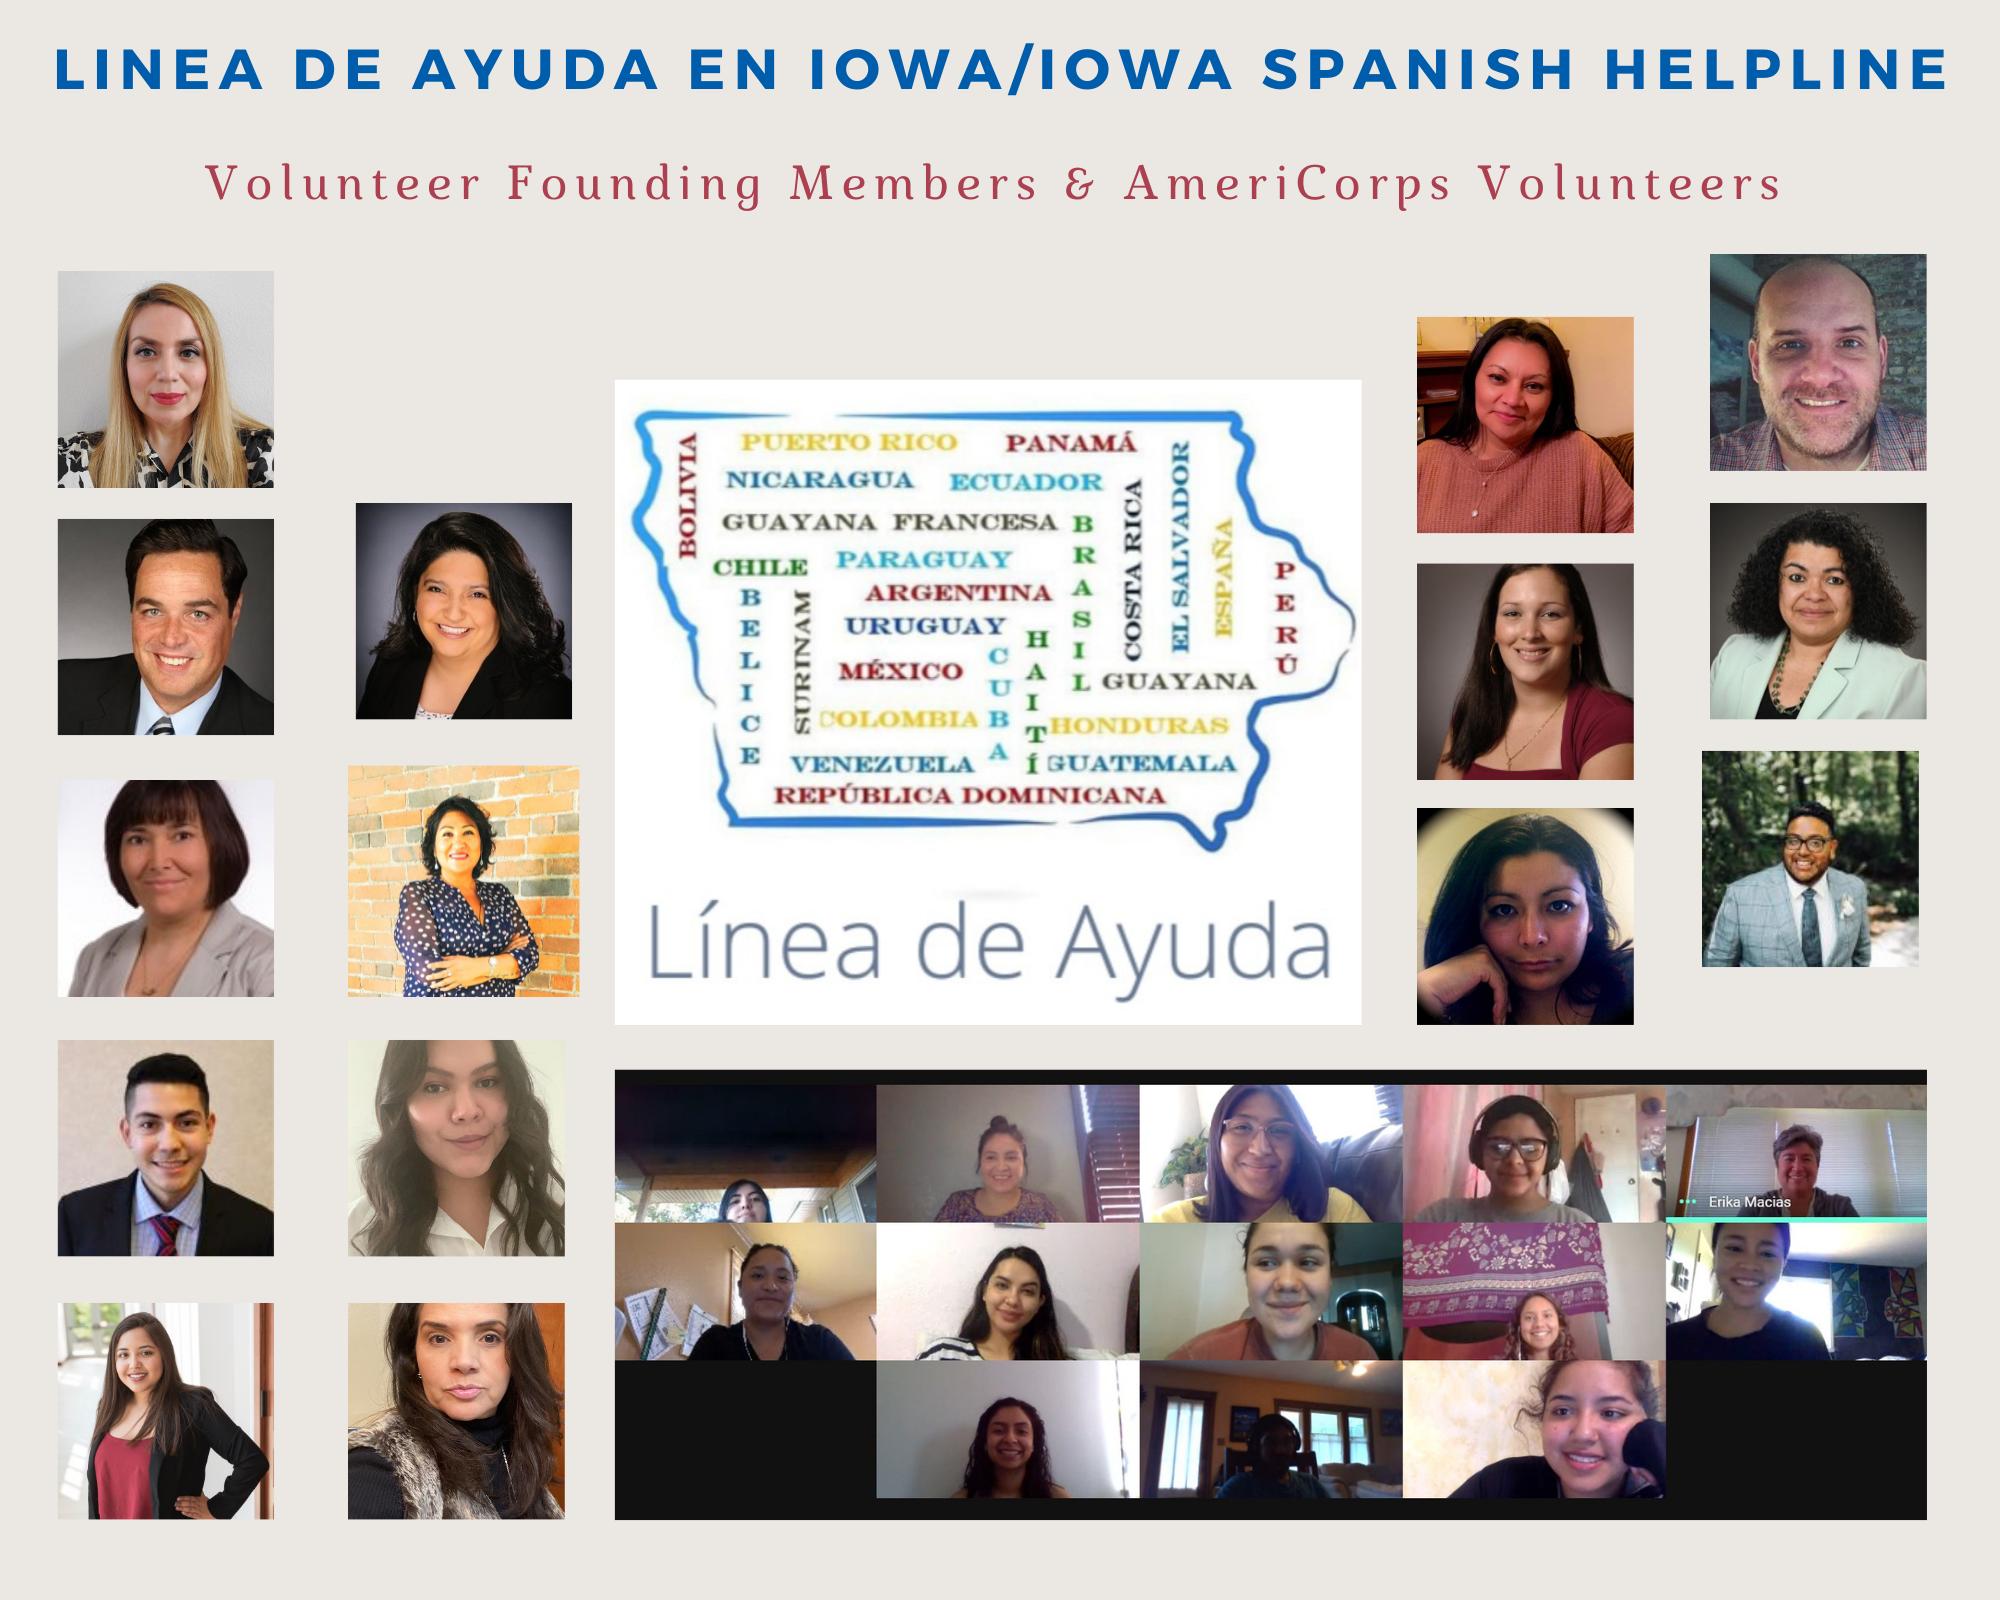 Spanish Helpline Founding Members